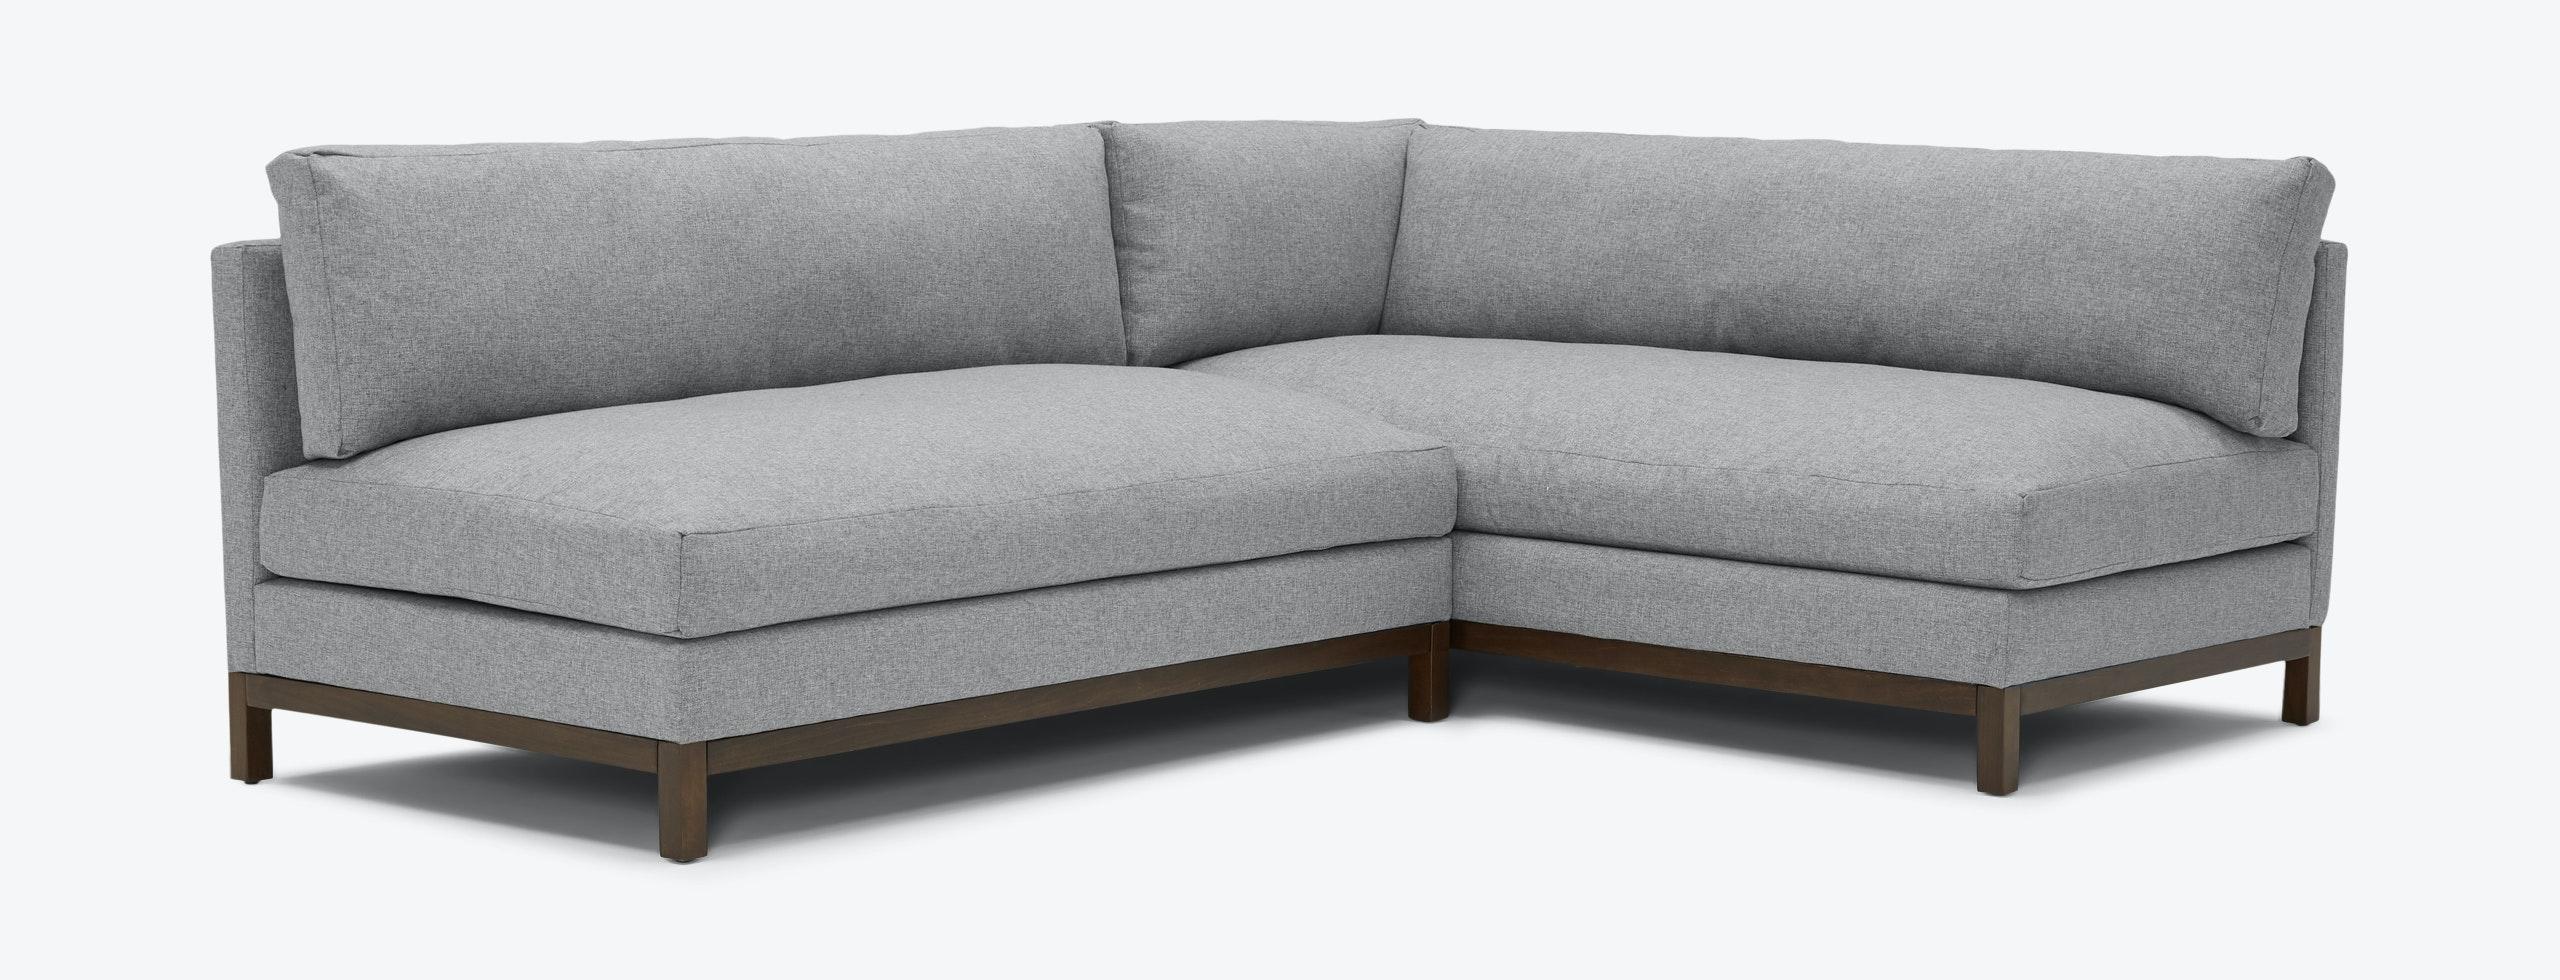 Phenomenal Arwen Corner Sectional Inzonedesignstudio Interior Chair Design Inzonedesignstudiocom